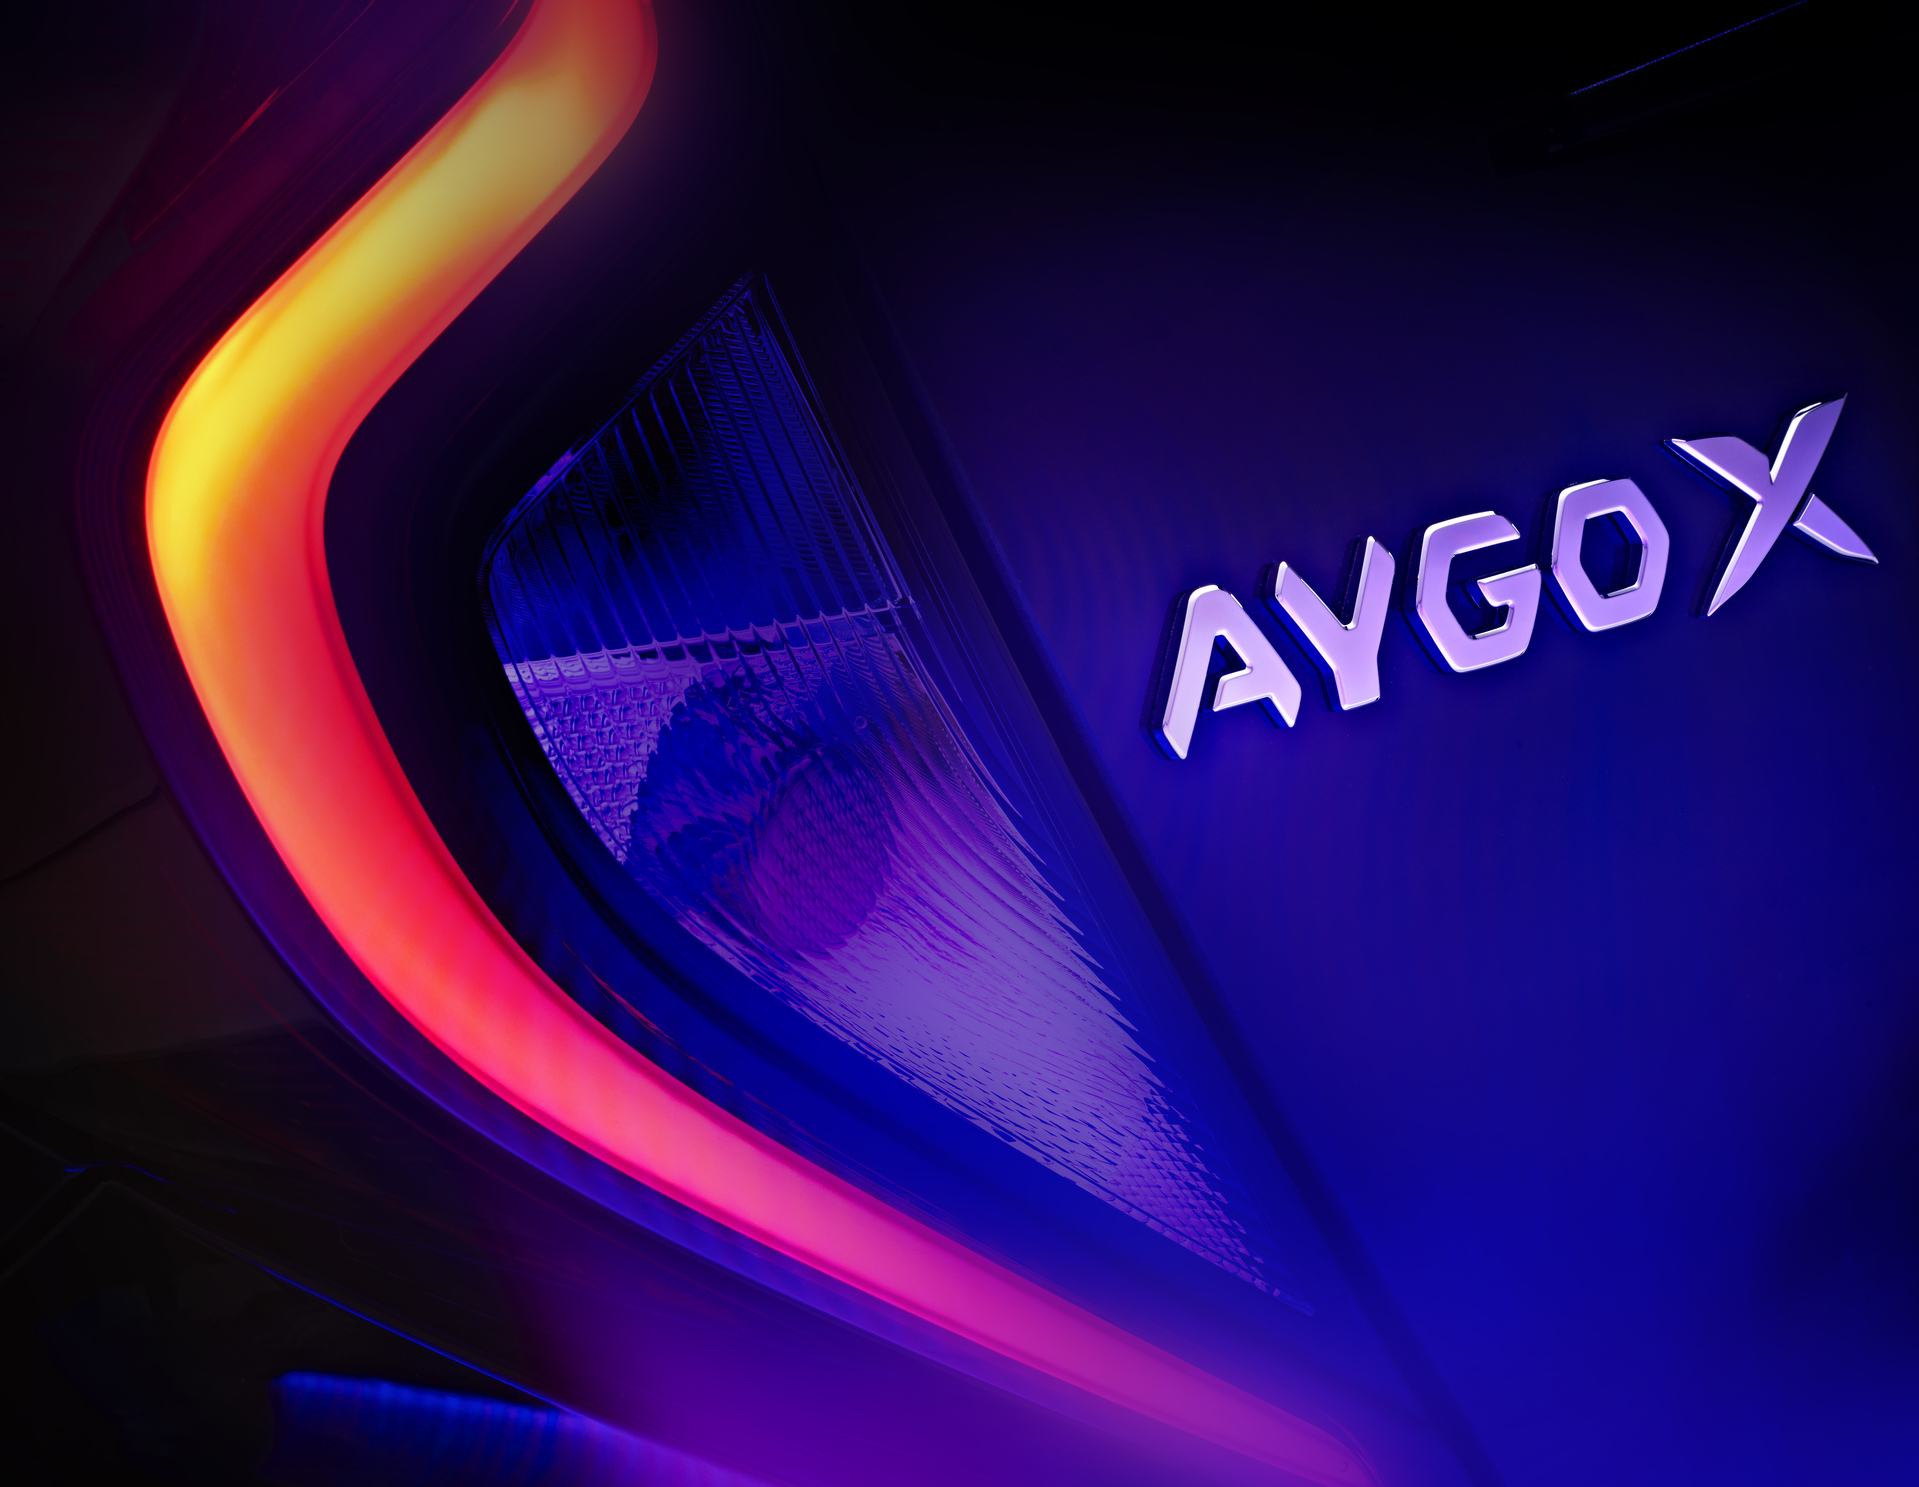 Aygox Teaser (1)